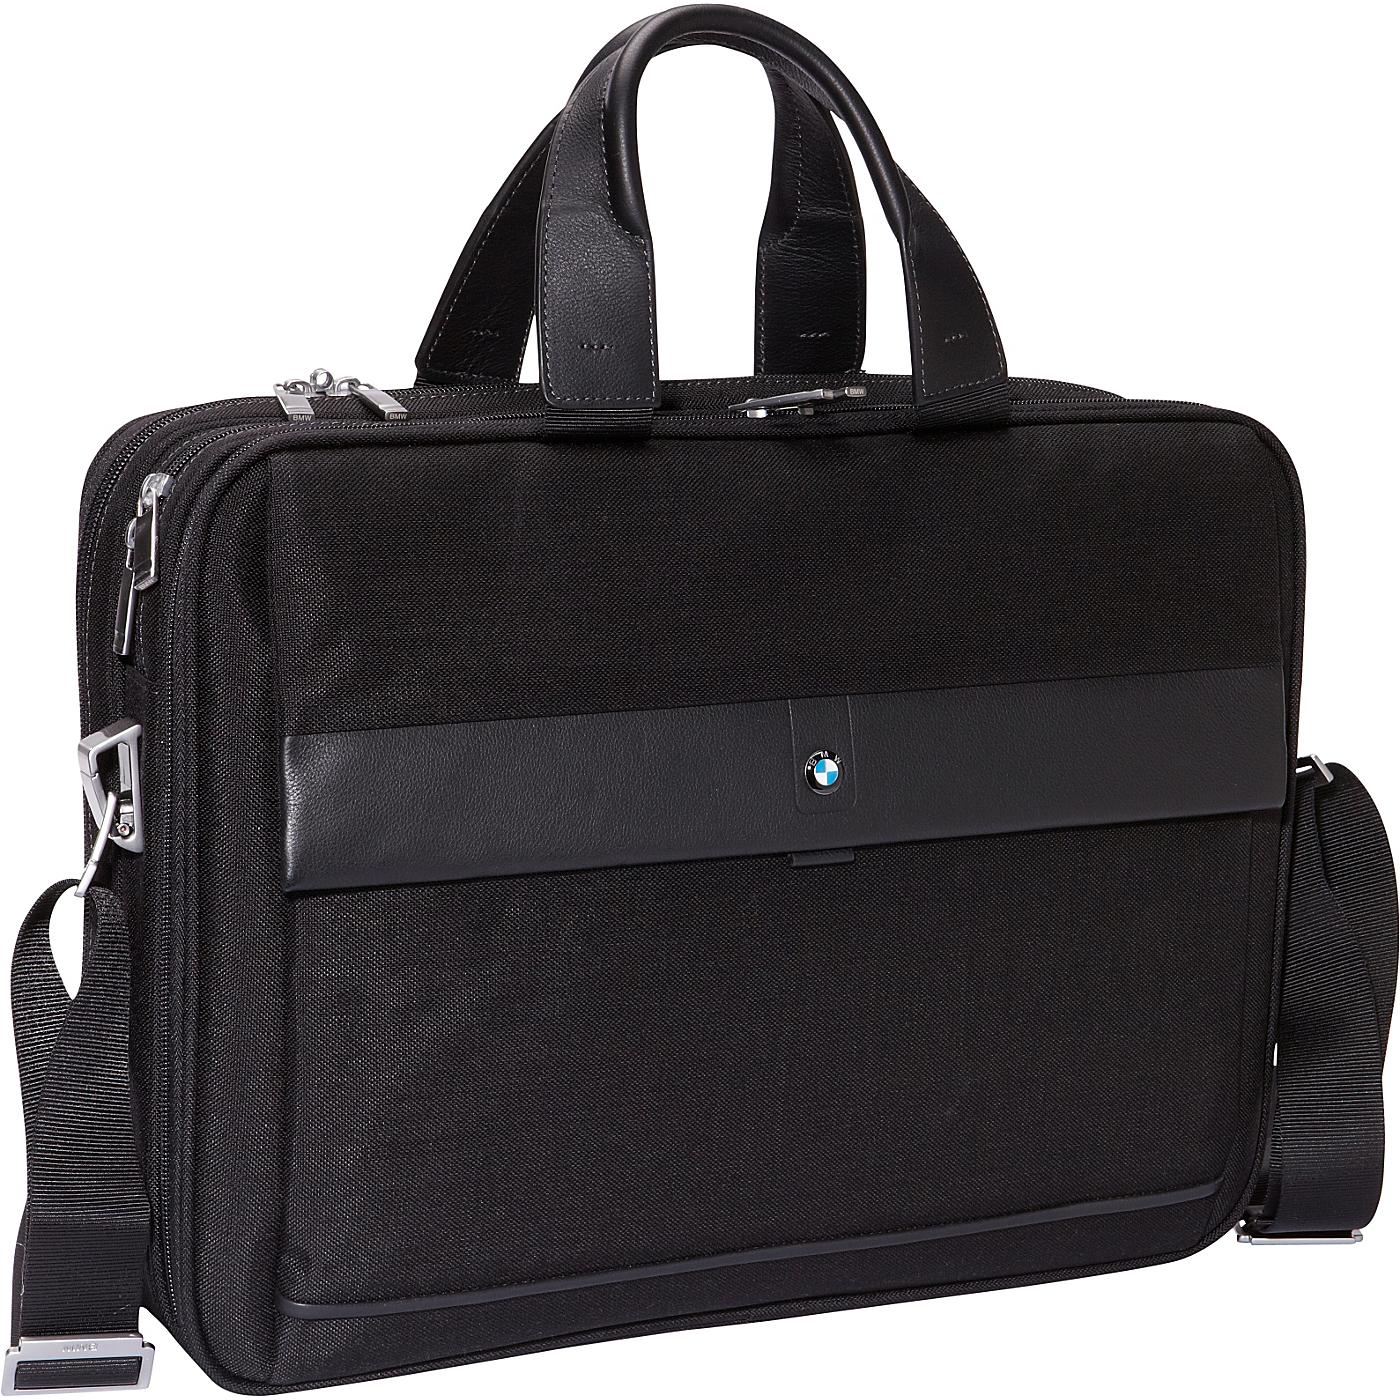 ScanSmart Toploader Black   BMW Luggage Non Wheeled Computer Cases